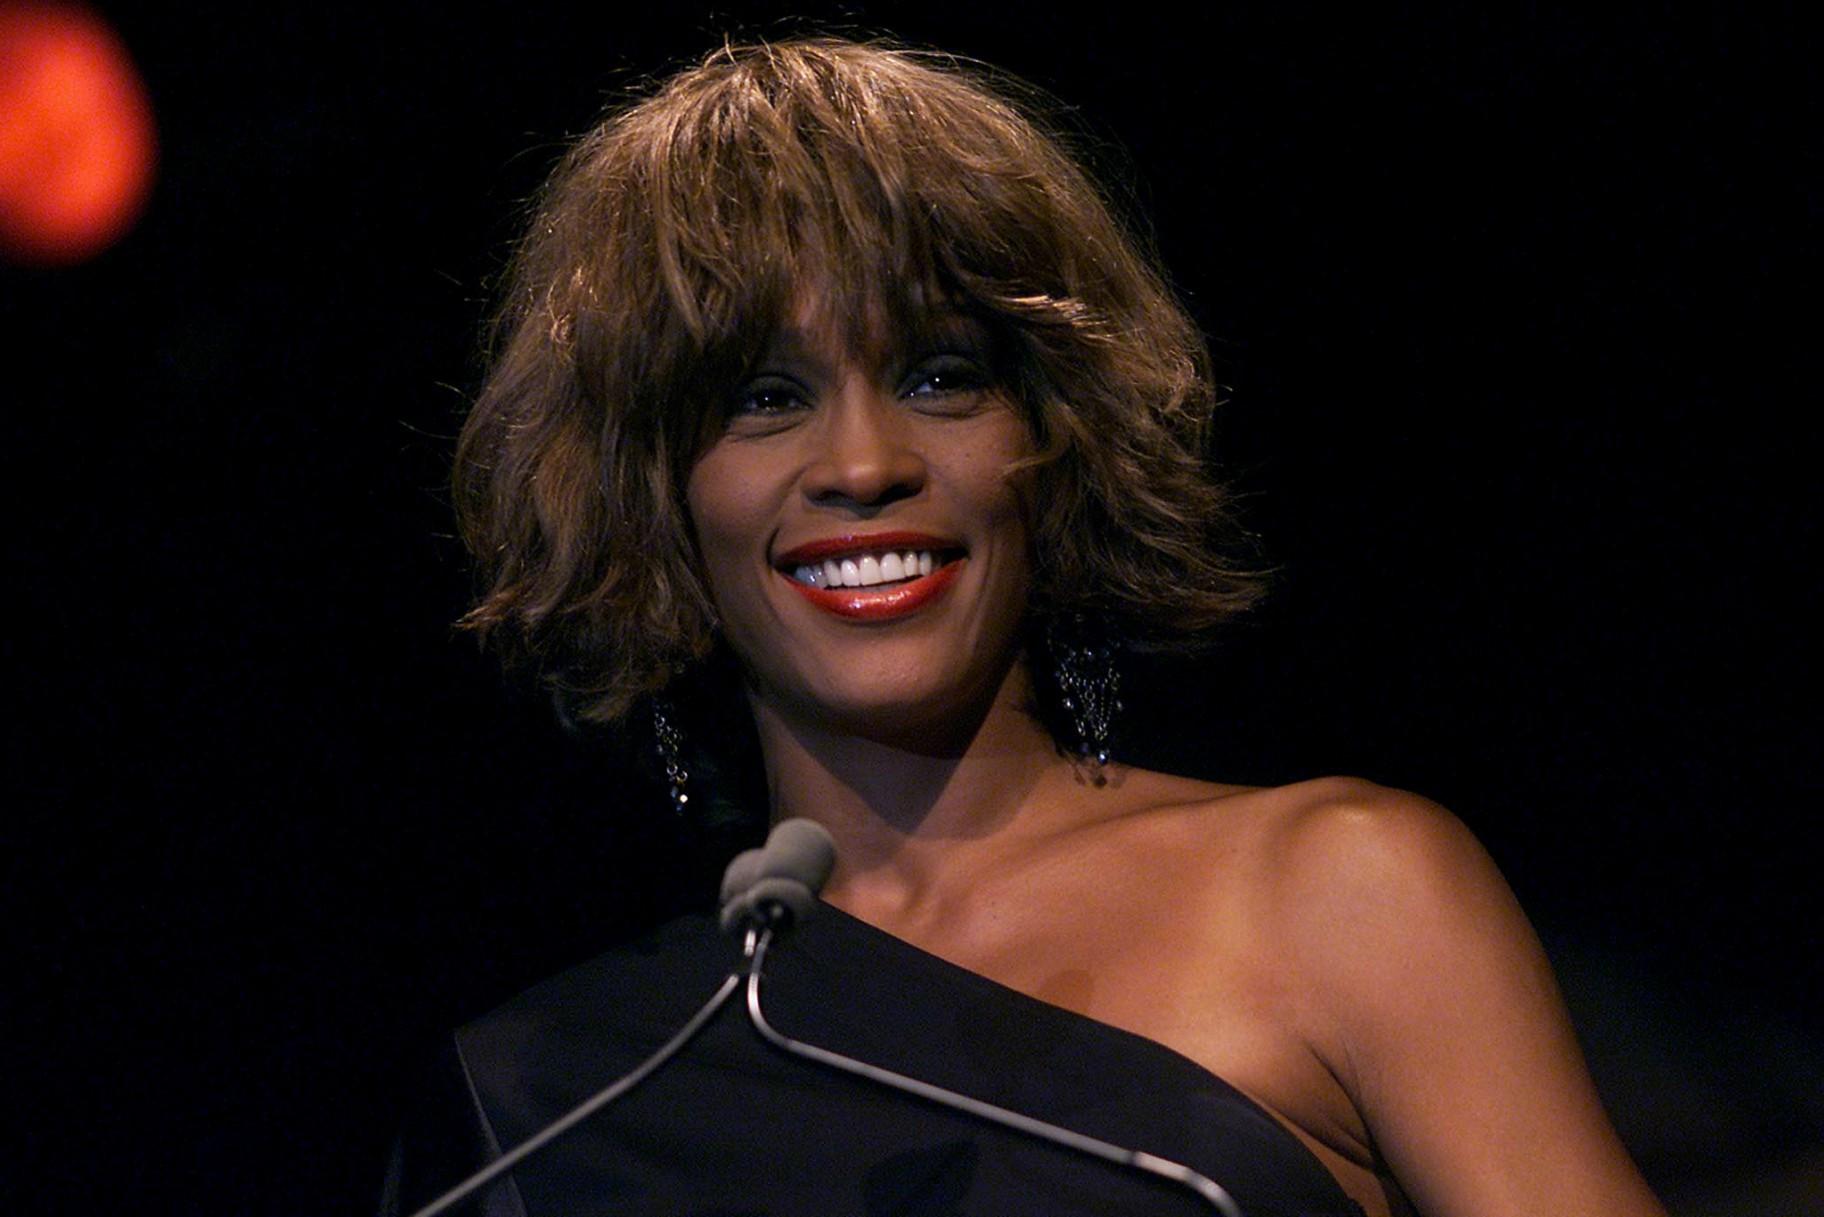 El nebot de Whitney Houston, lletra explosiva sobre la família Houston